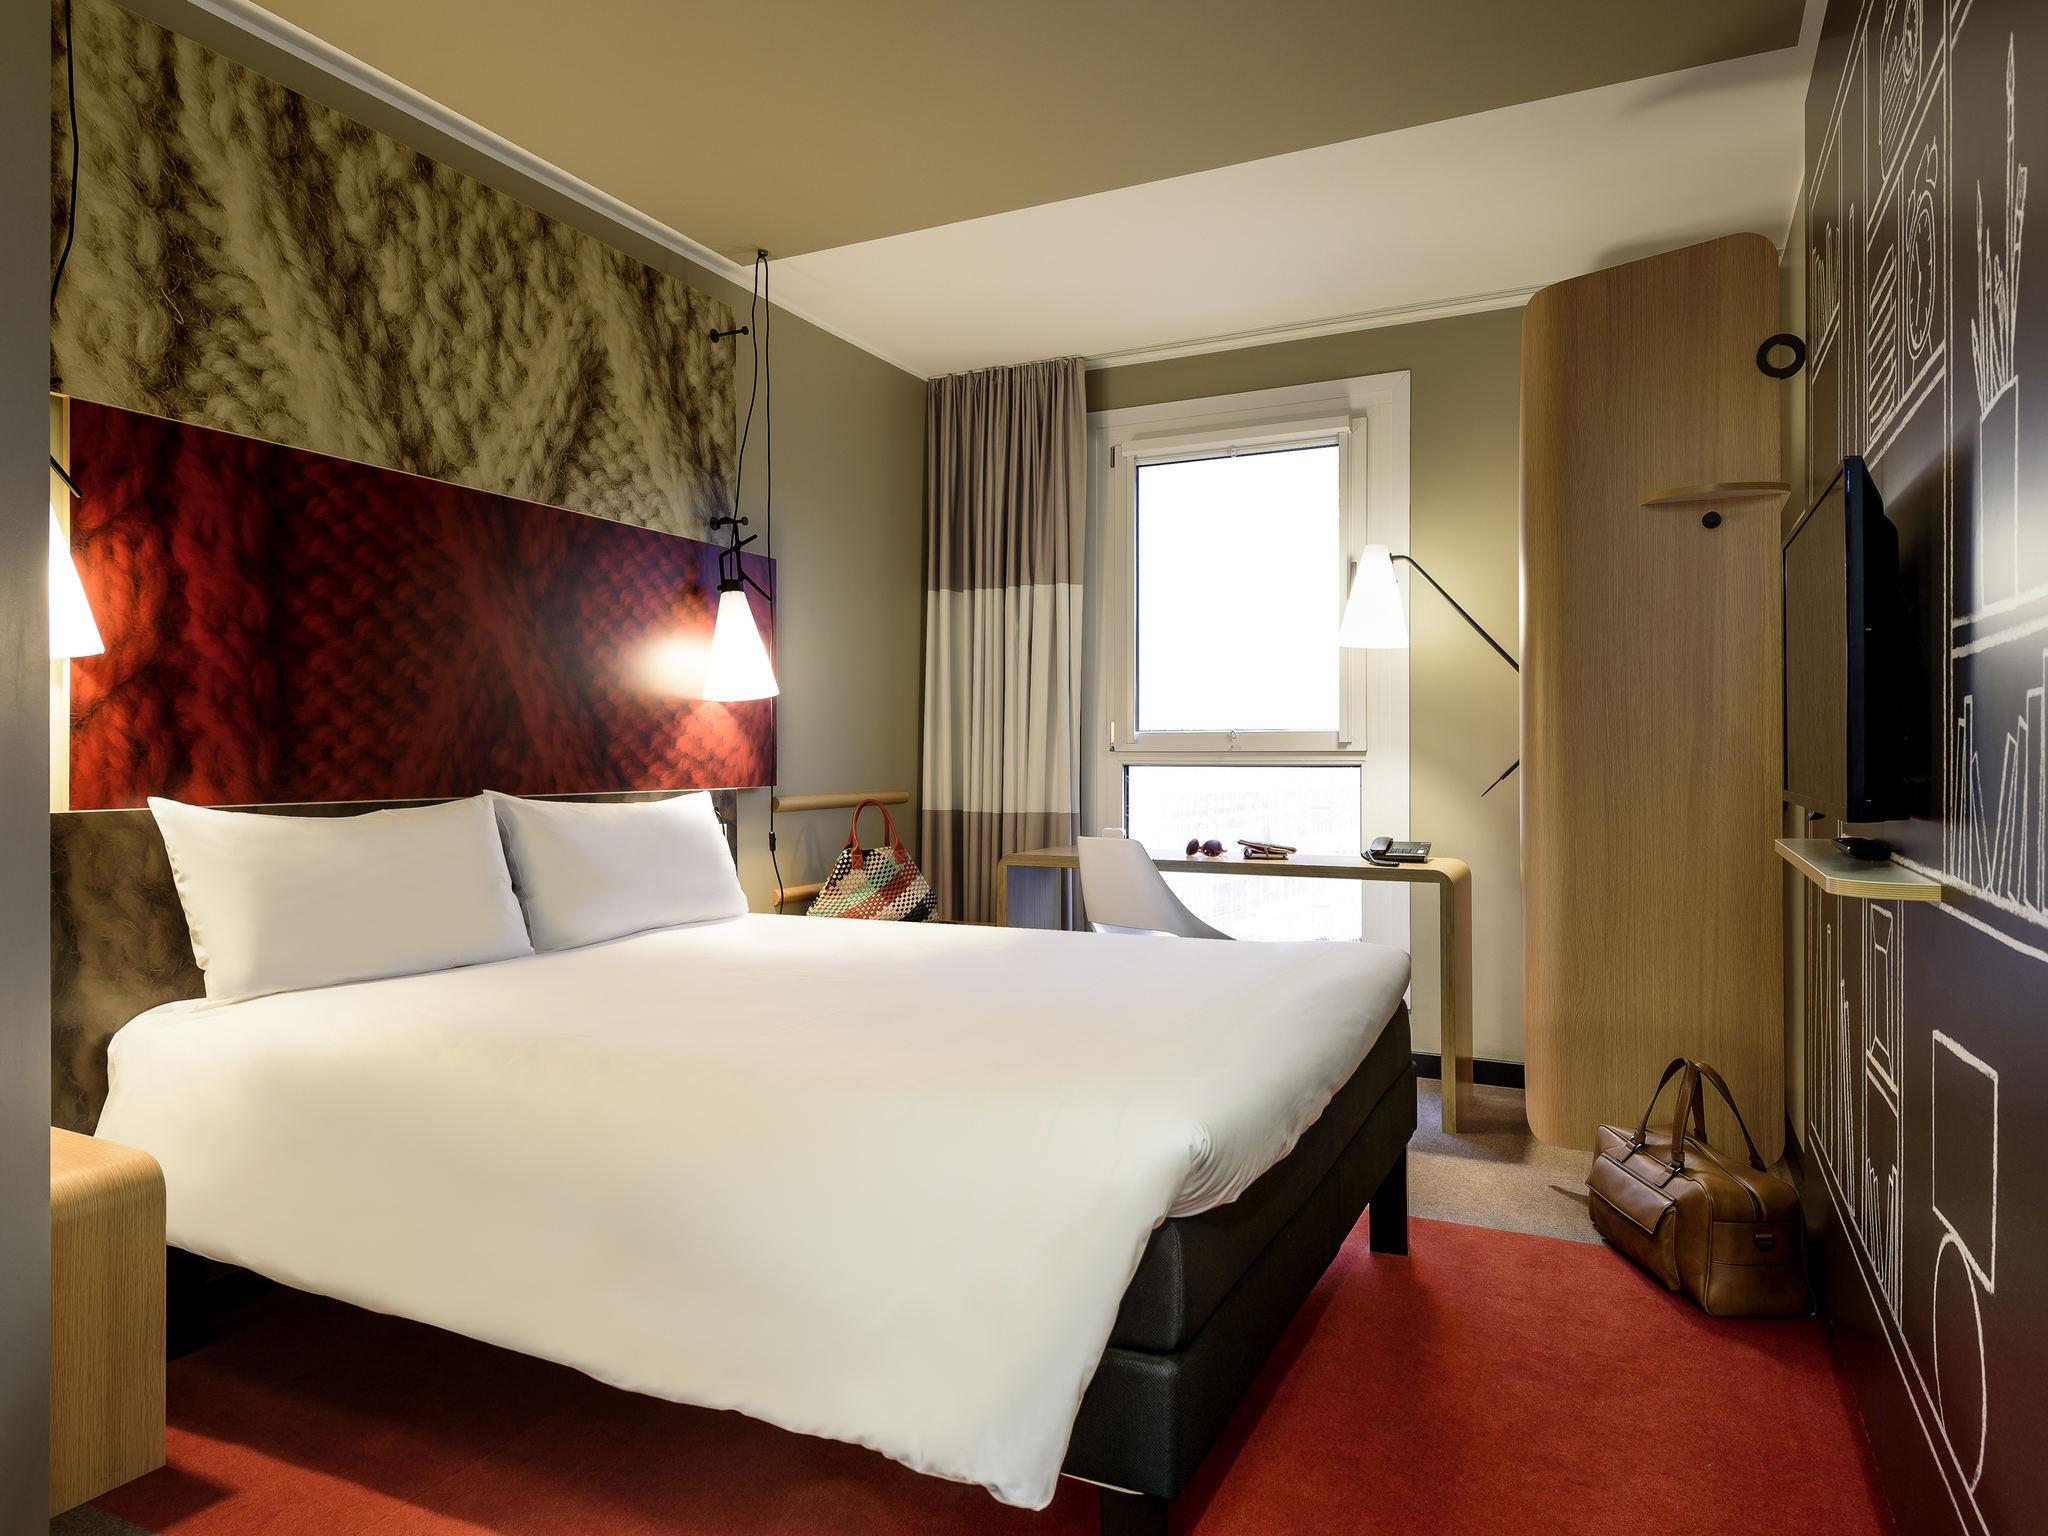 hotel in leipzig ibis leipzig city. Black Bedroom Furniture Sets. Home Design Ideas